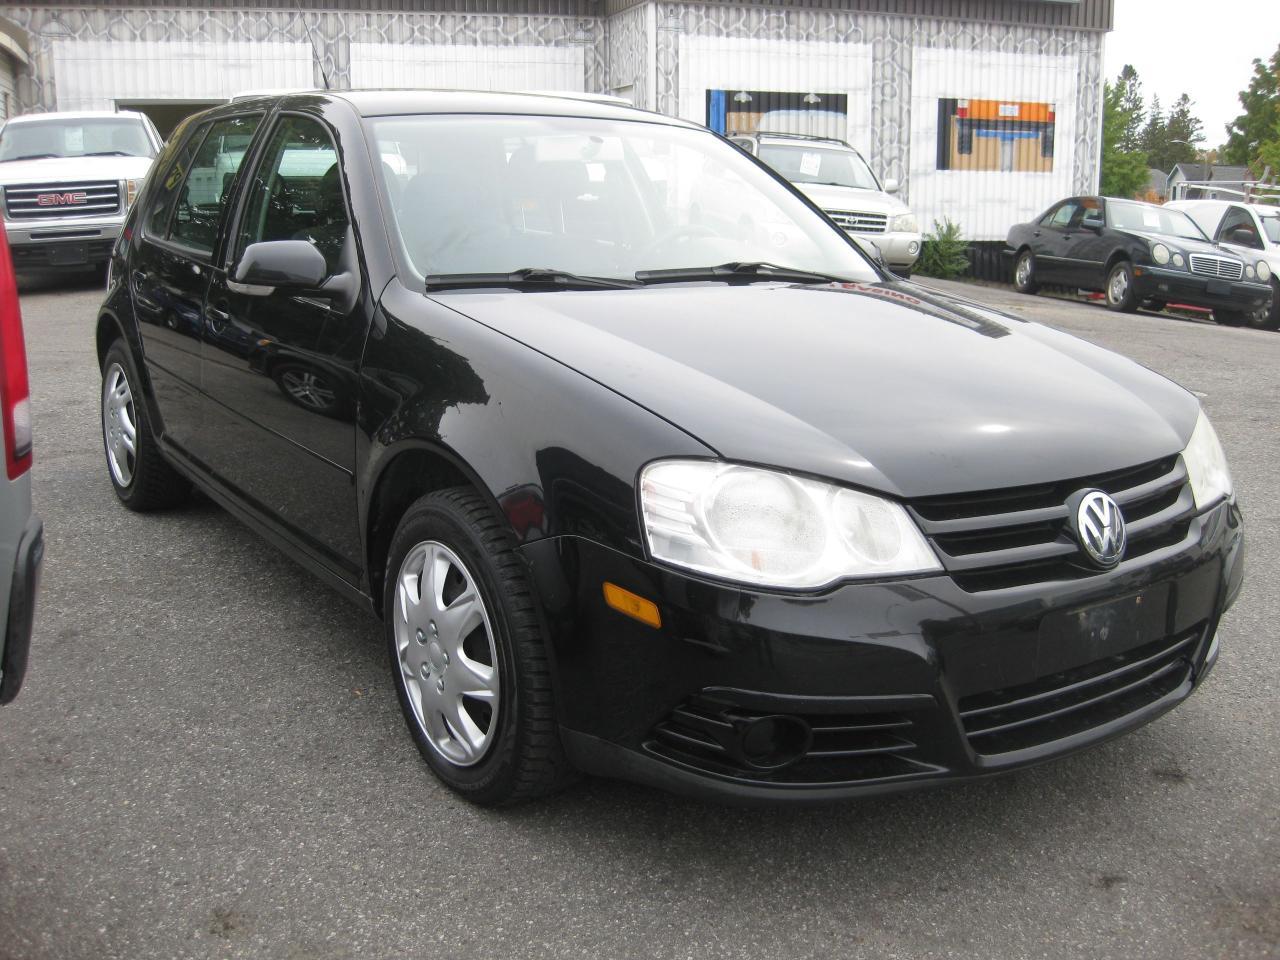 2008 Volkswagen City Golf Manual 4cyl Hatchback 5pass